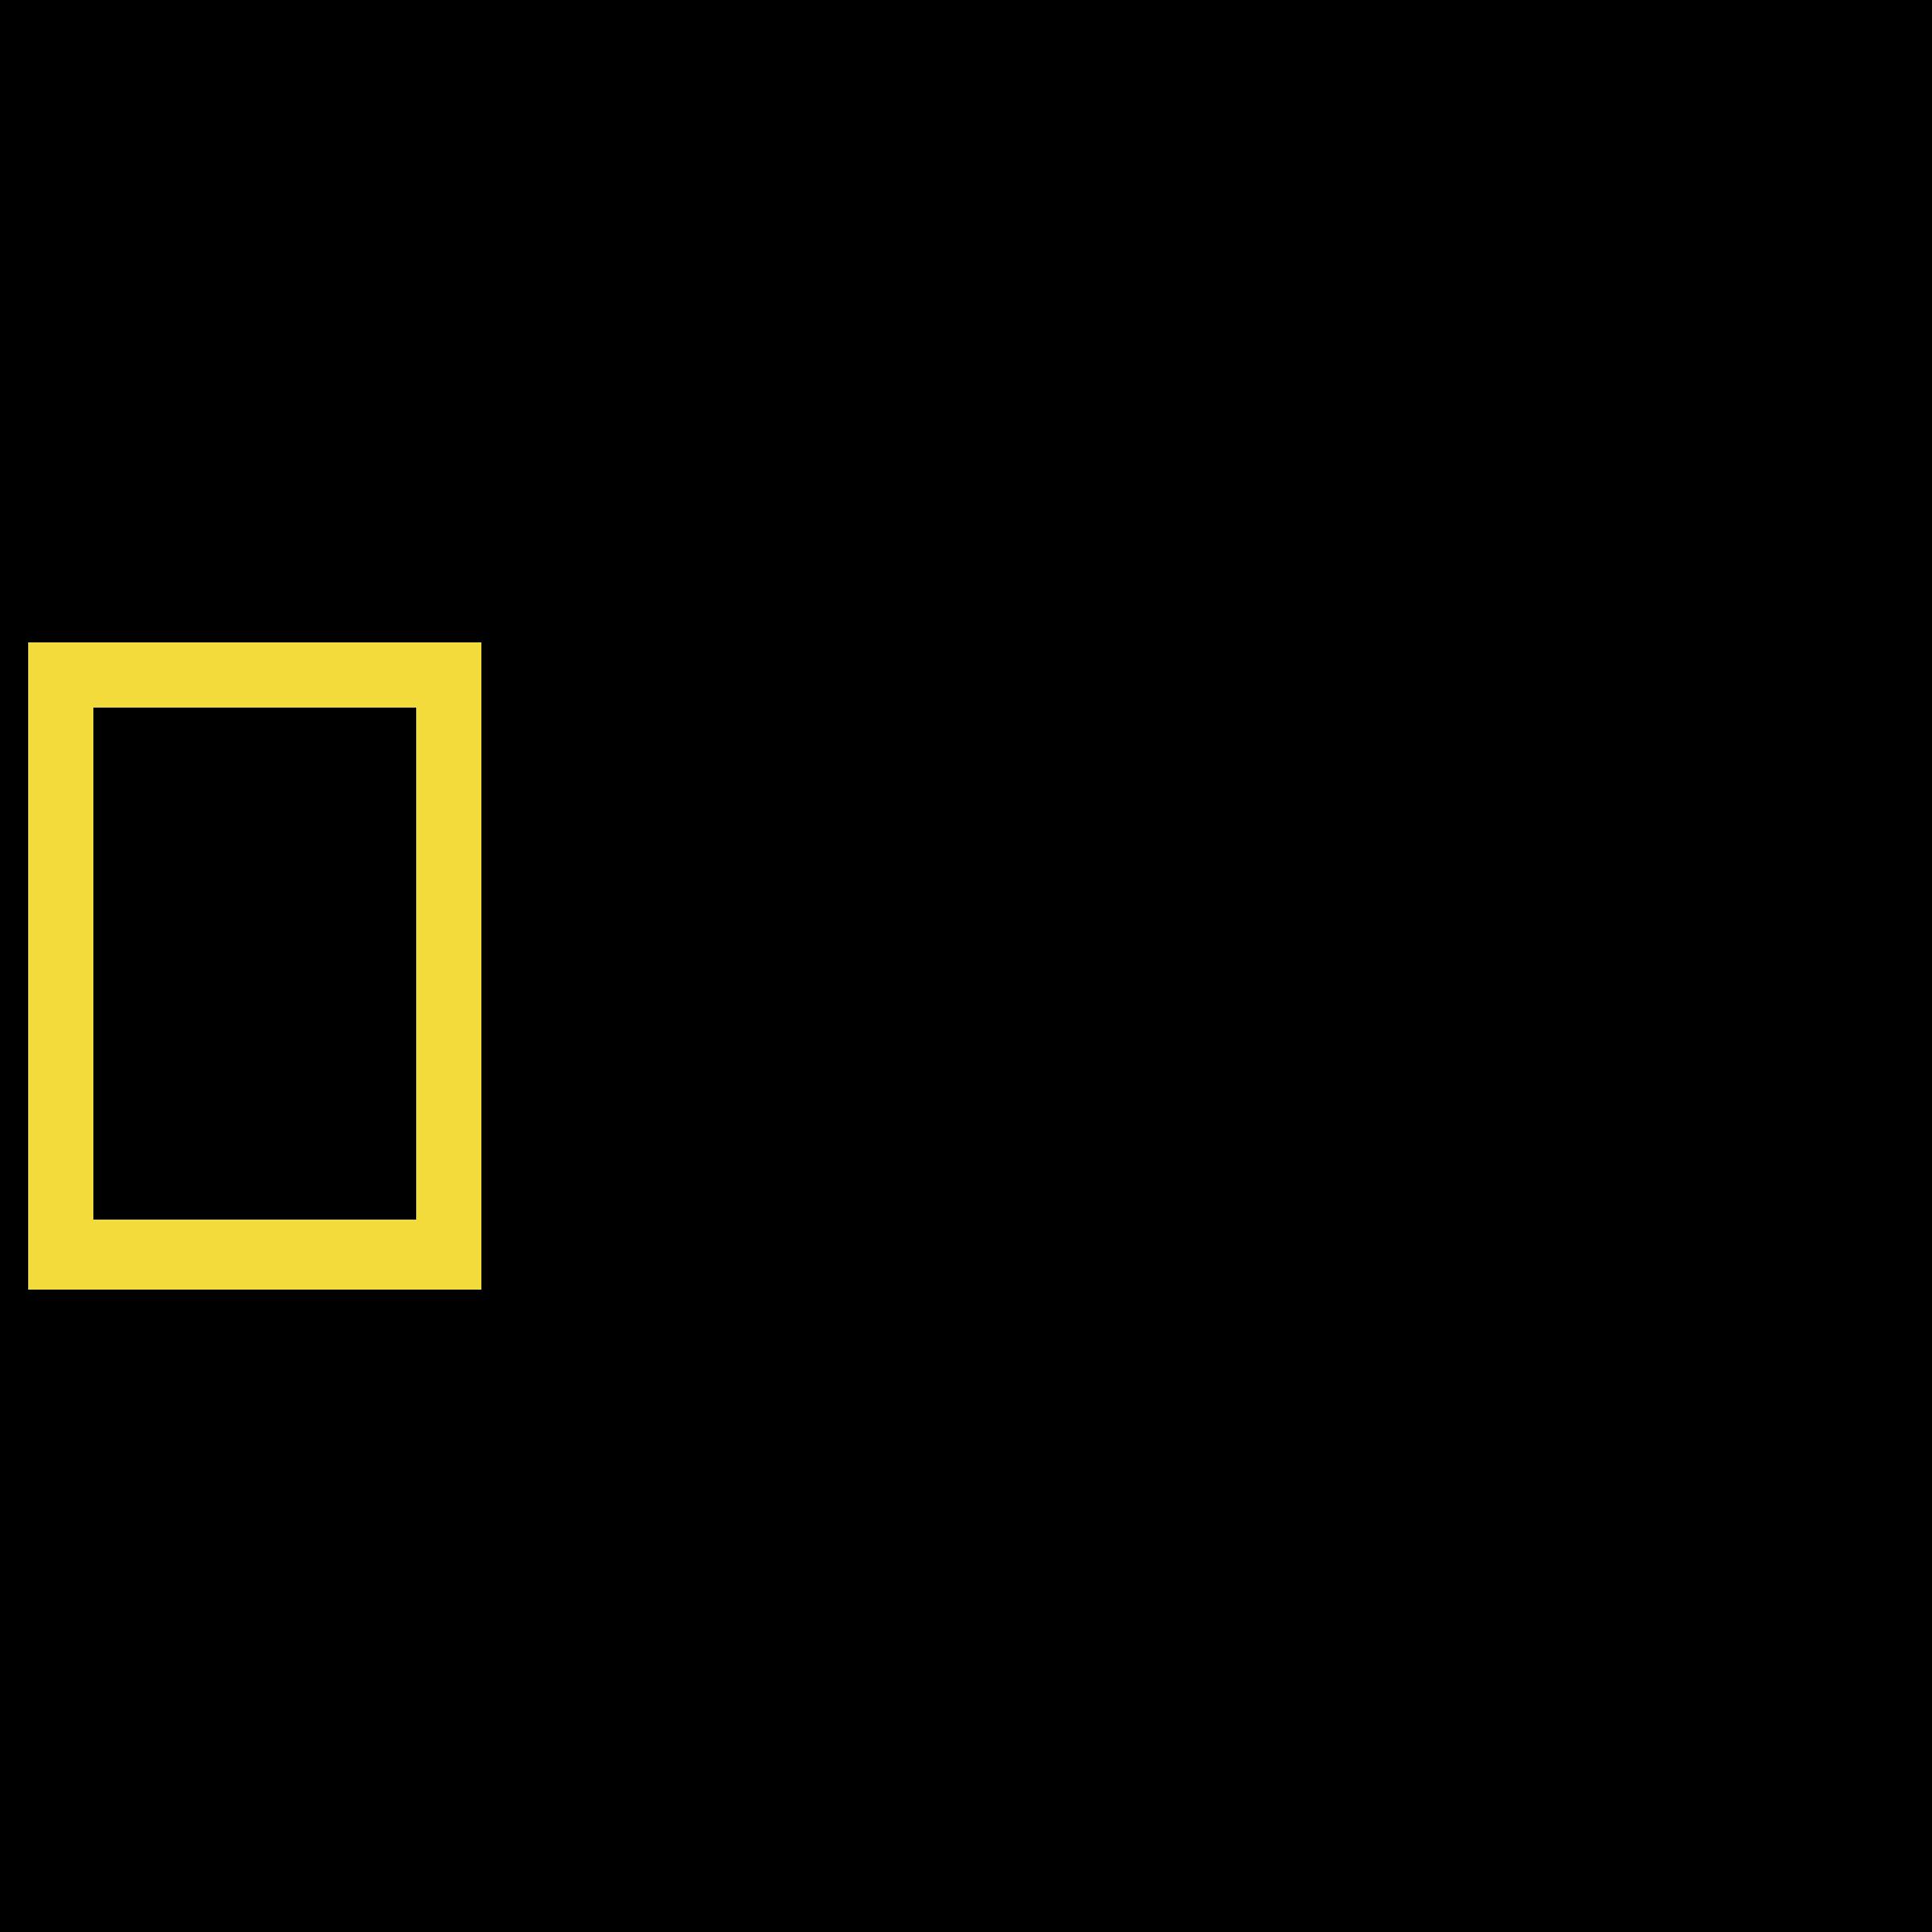 National Geographic Channel Logo PNG Transparent & SVG.